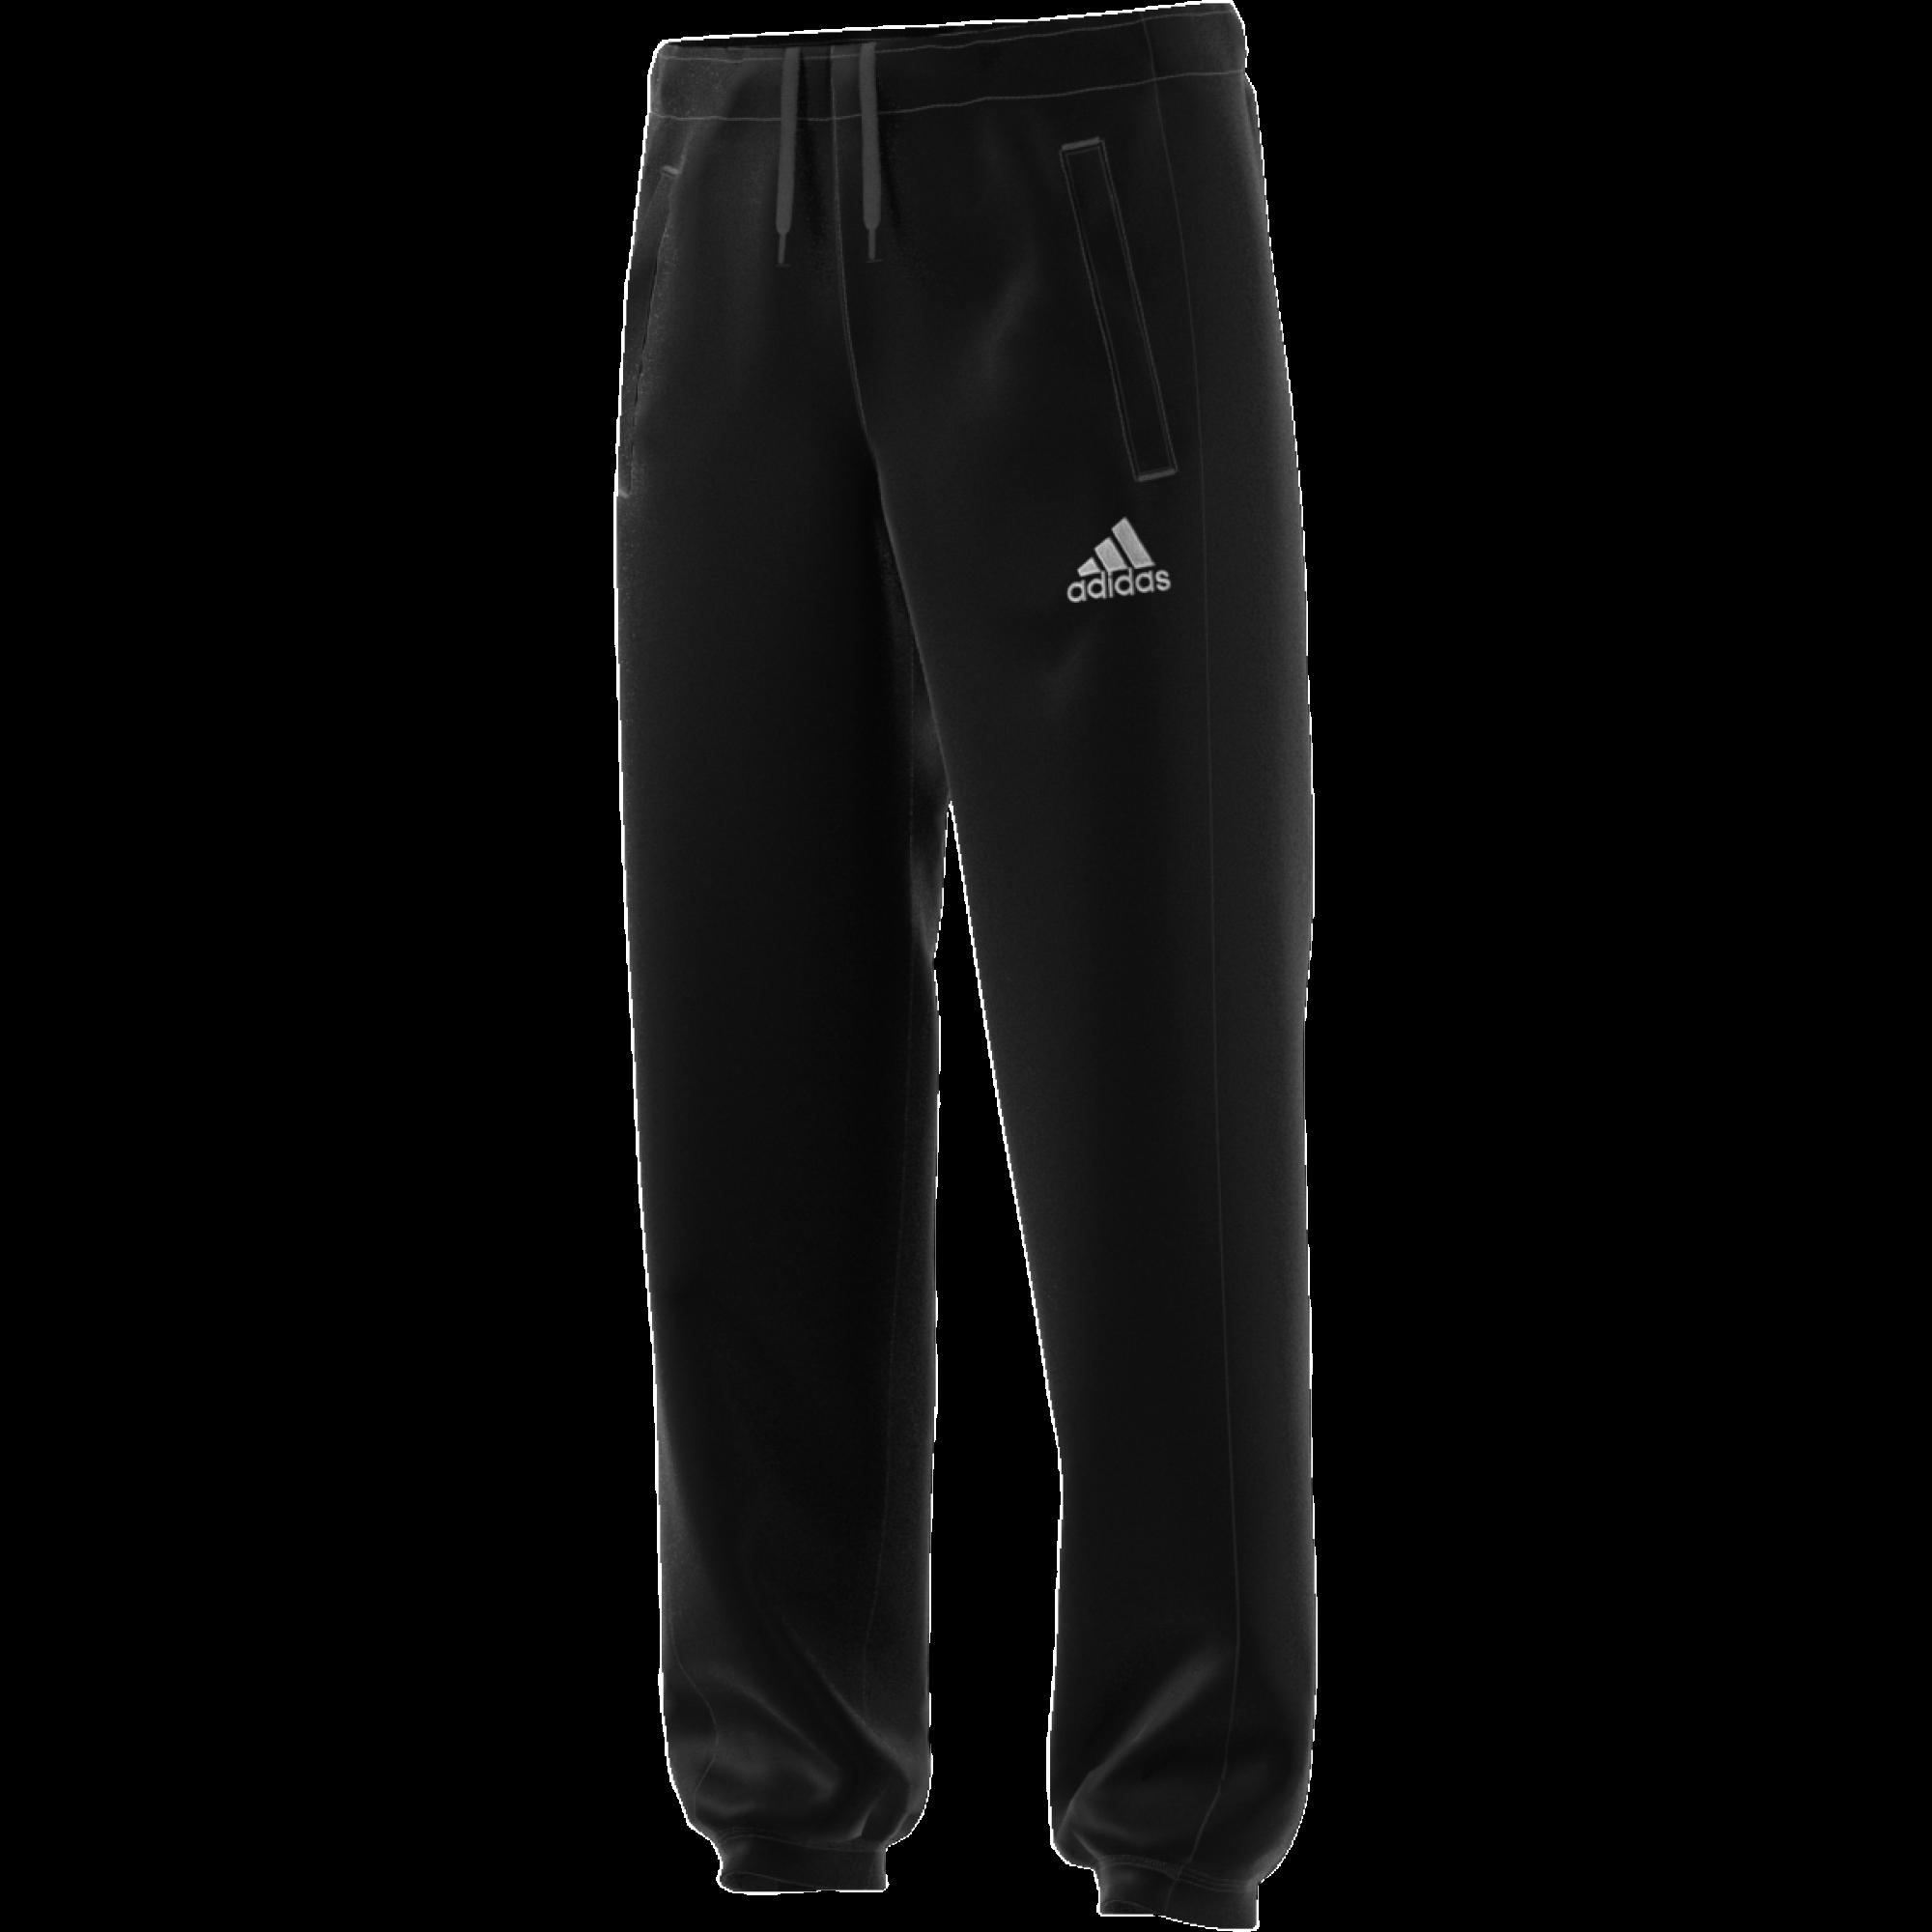 Bosbury CC Adidas Black Sweat Pants